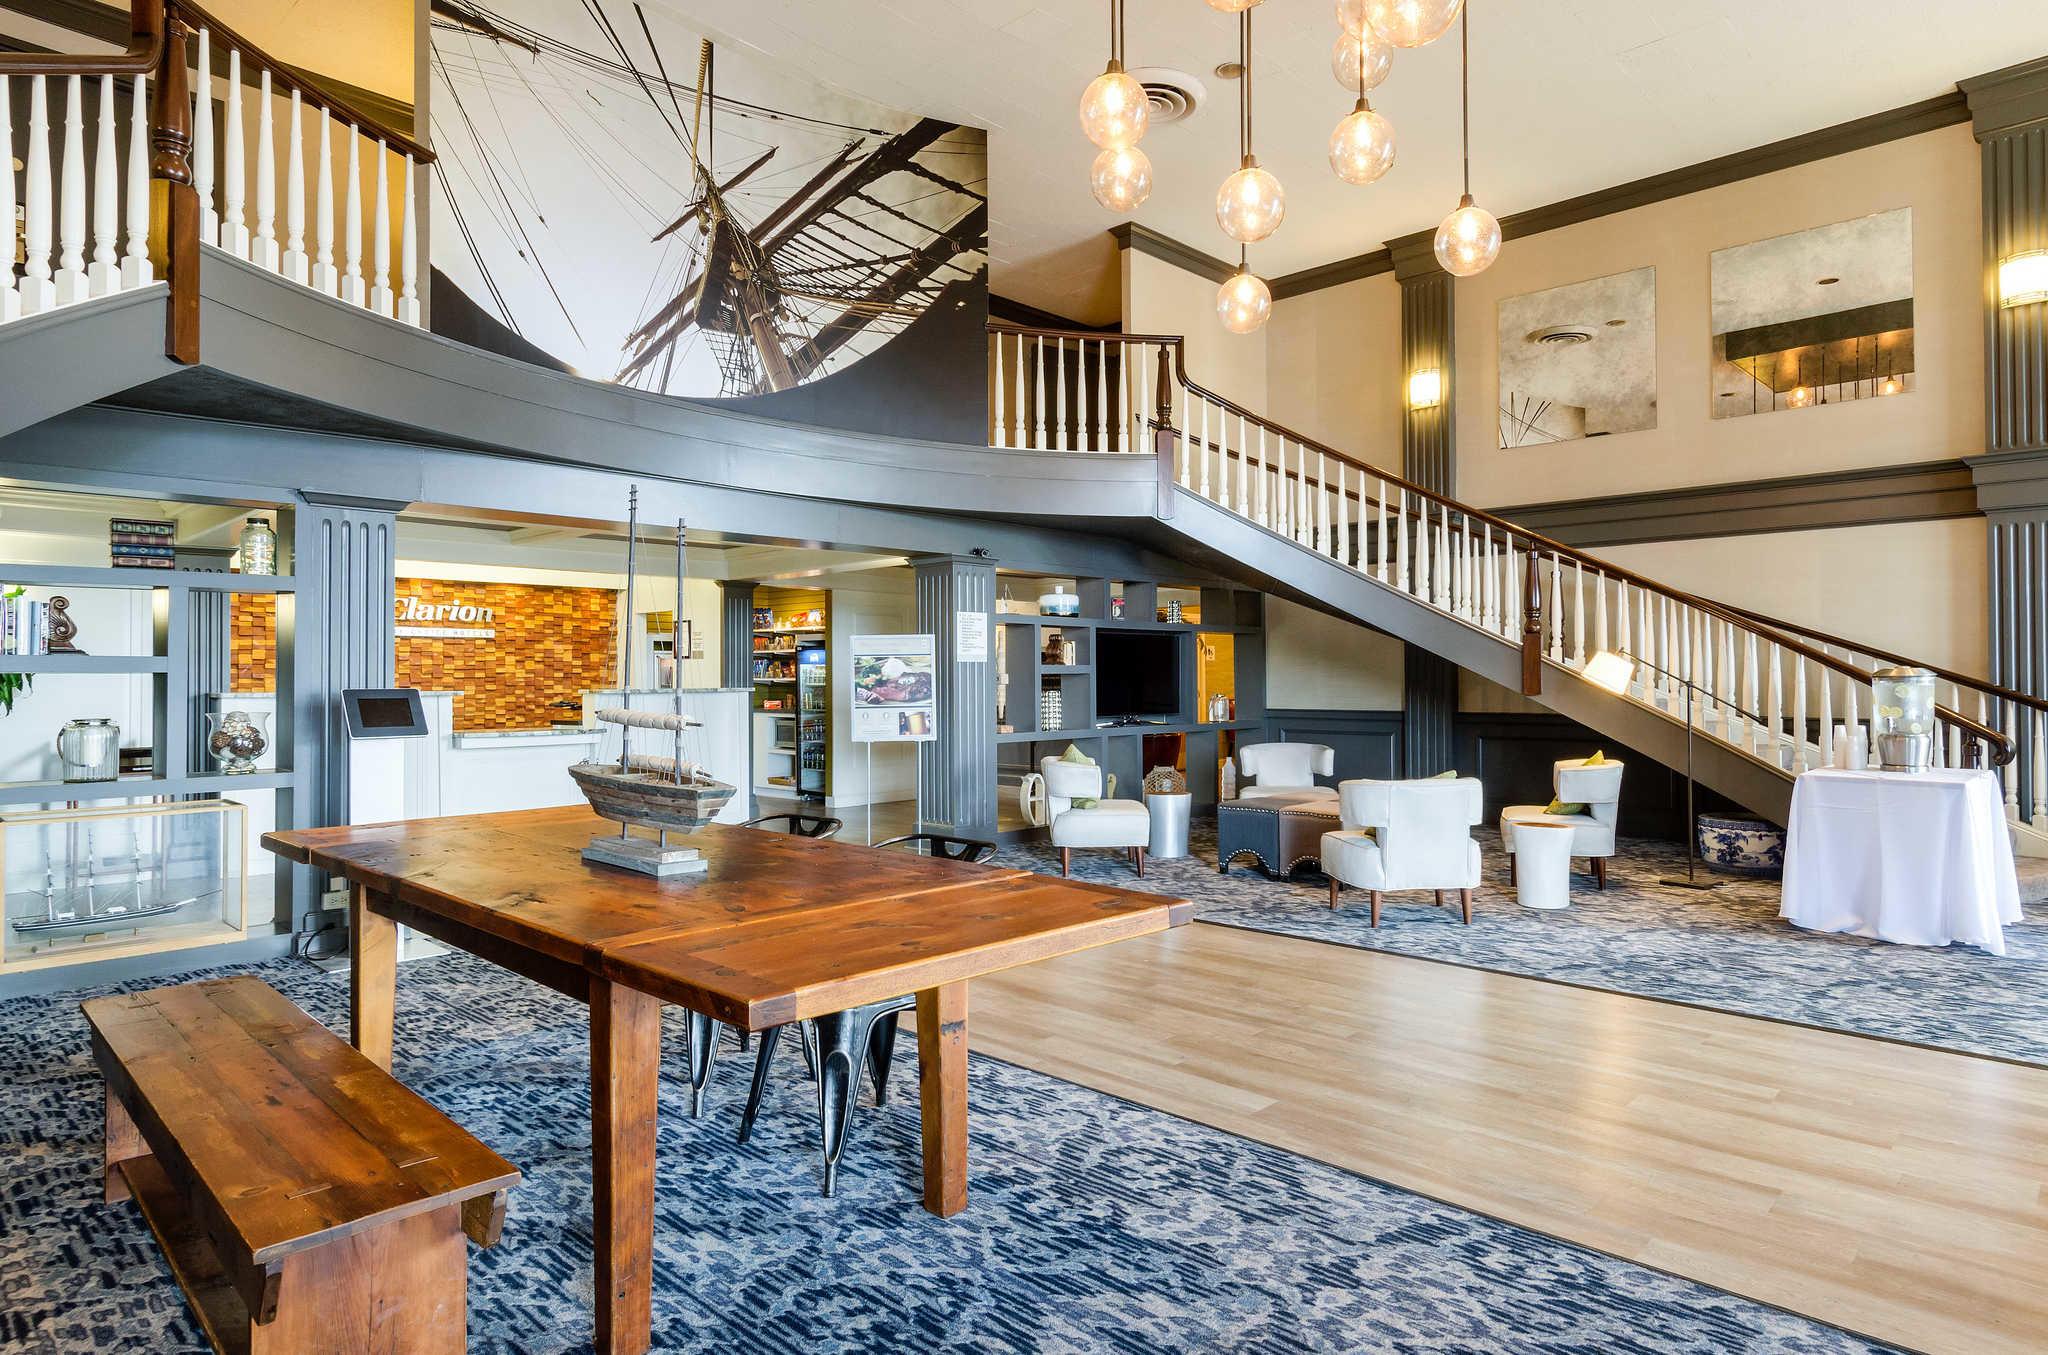 Clarion Inn Seekonk - Providence image 5